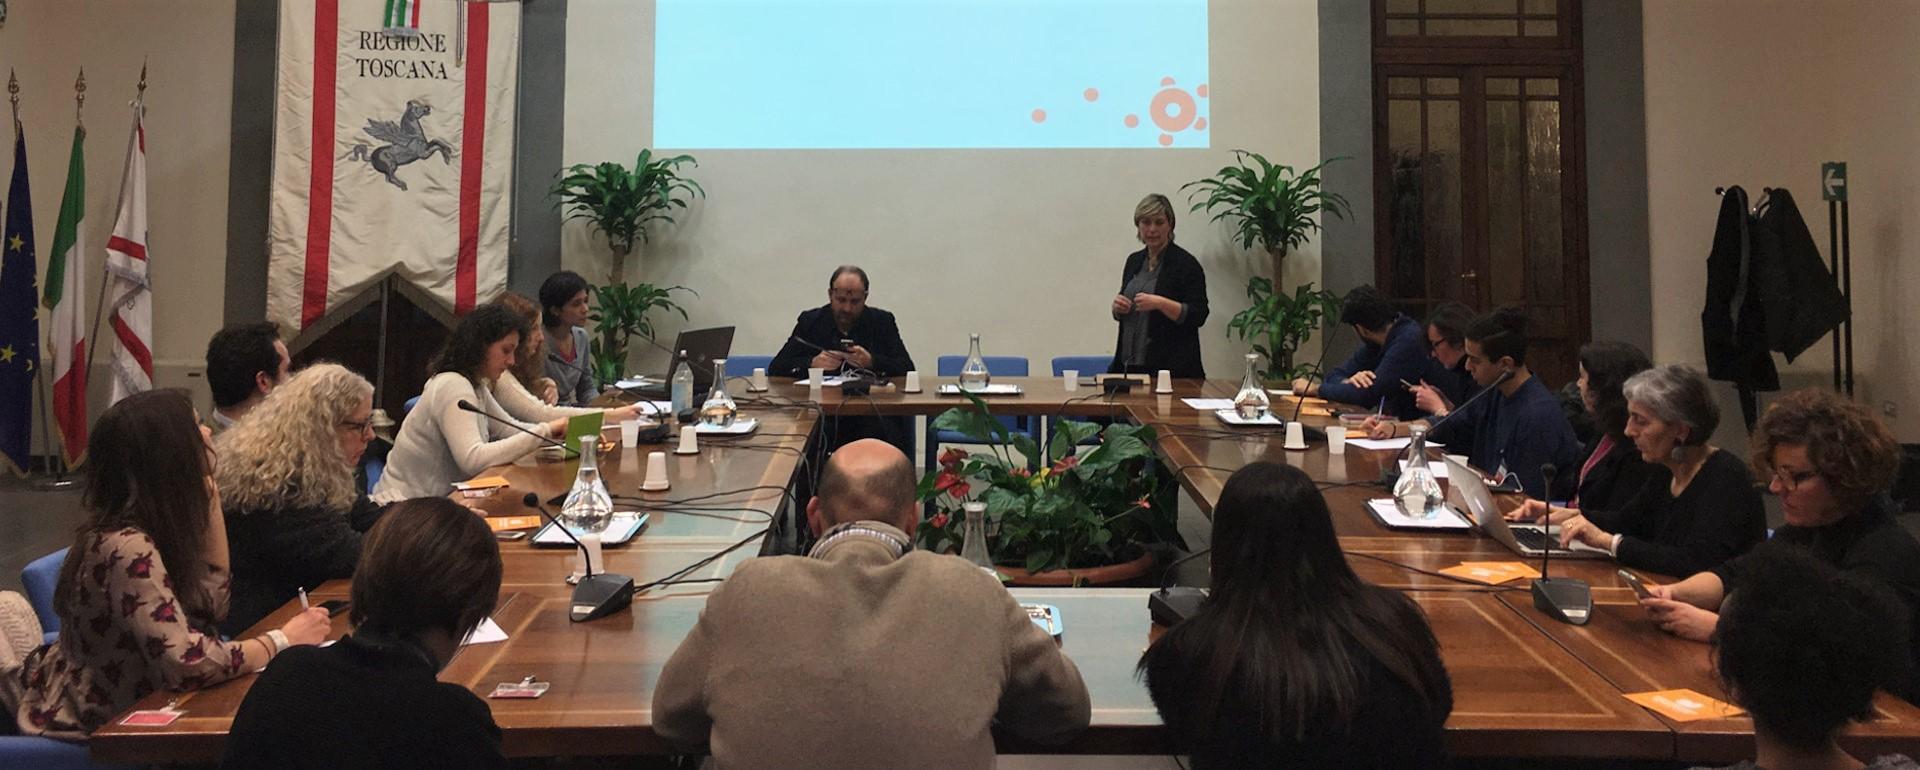 https://giovanisi.it/2012/12/13/giovanisi-lab-tavolo-giovani/